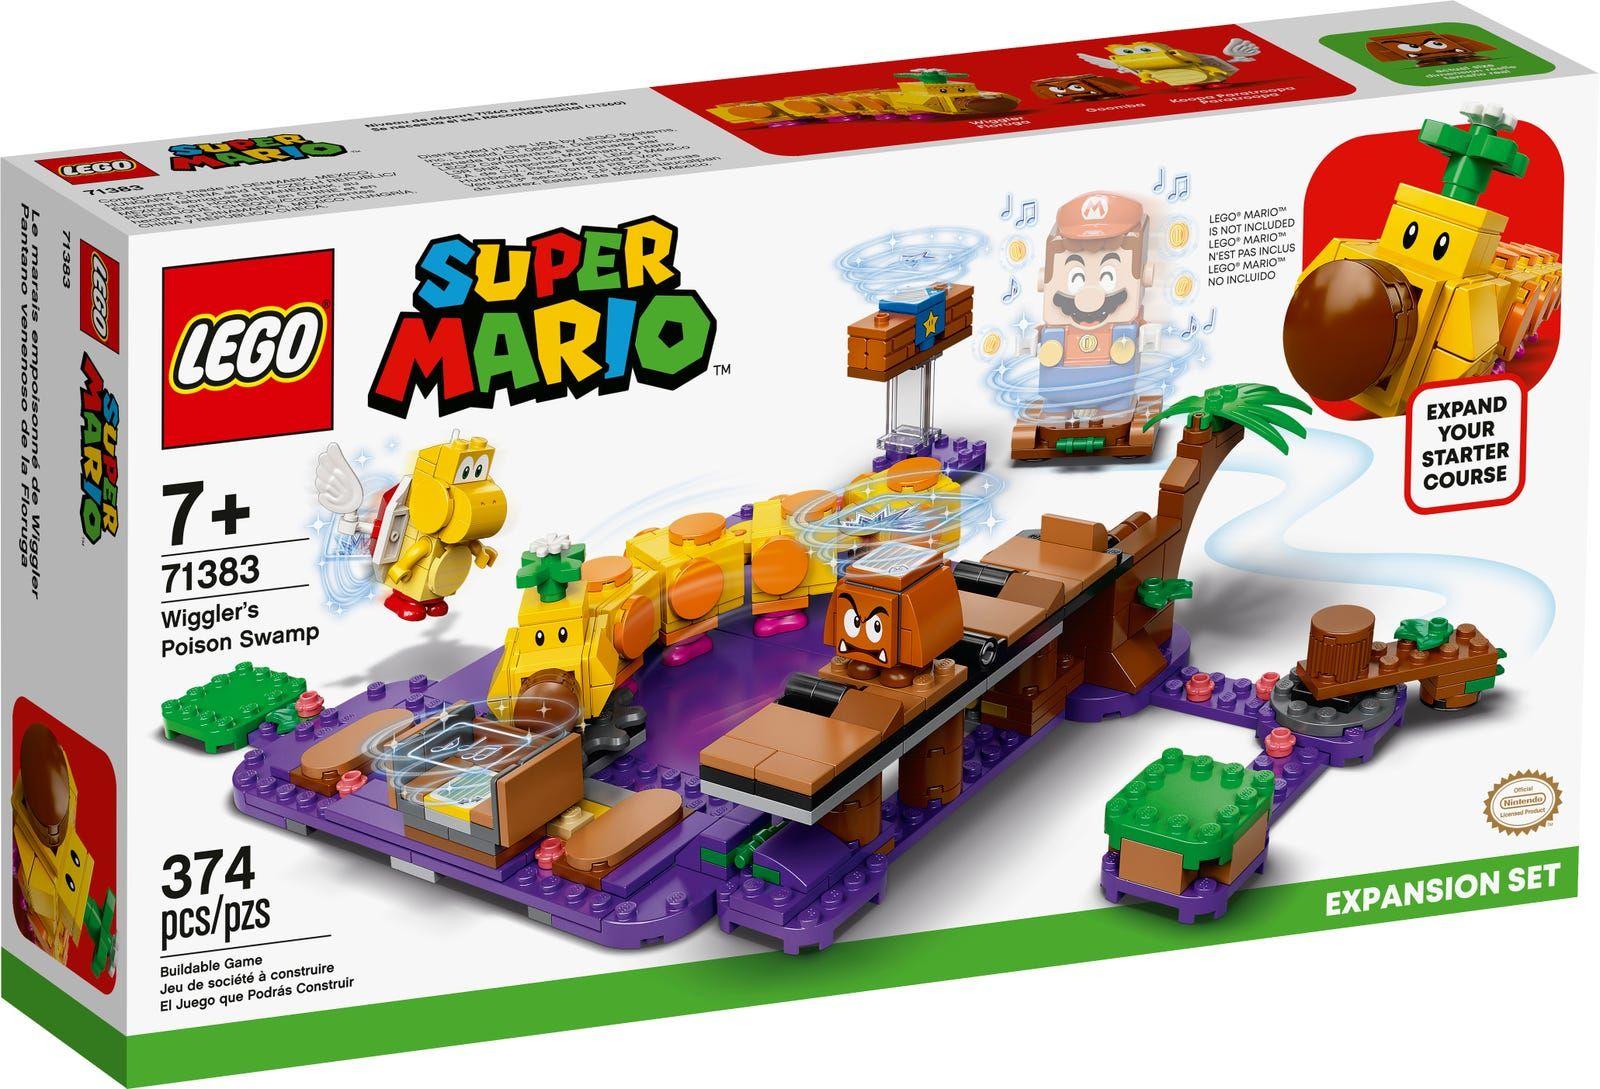 LEGO 71383 Super Mario Wigglers Poison Swamp